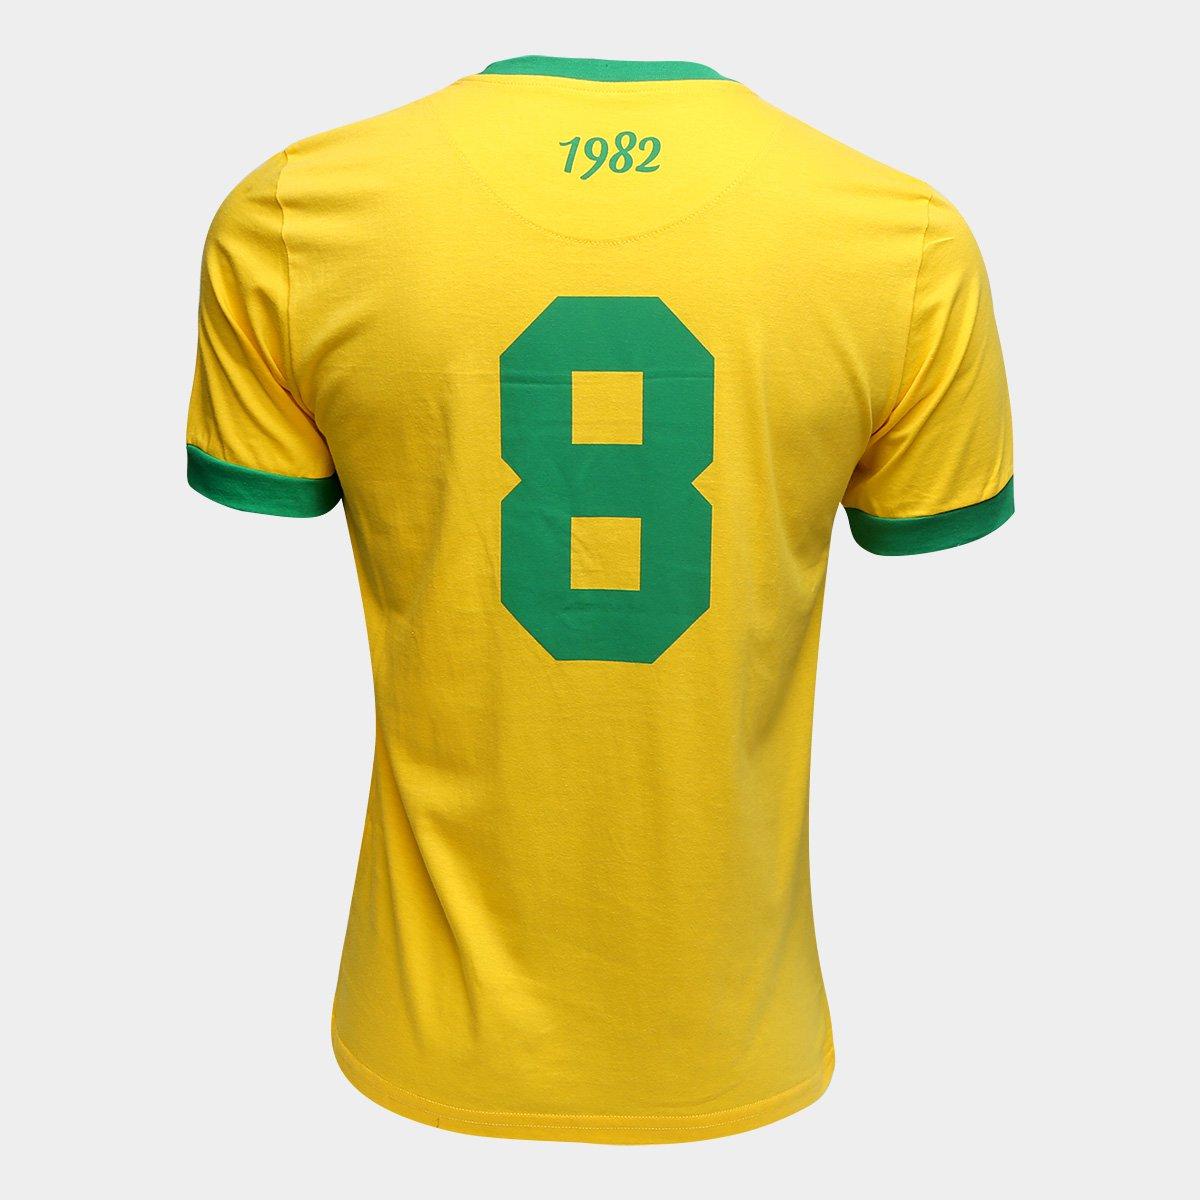 Camiseta Brasil 1982 Retrô Times Masculina - Amarelo - Compre Agora ... ad827742b5bd6